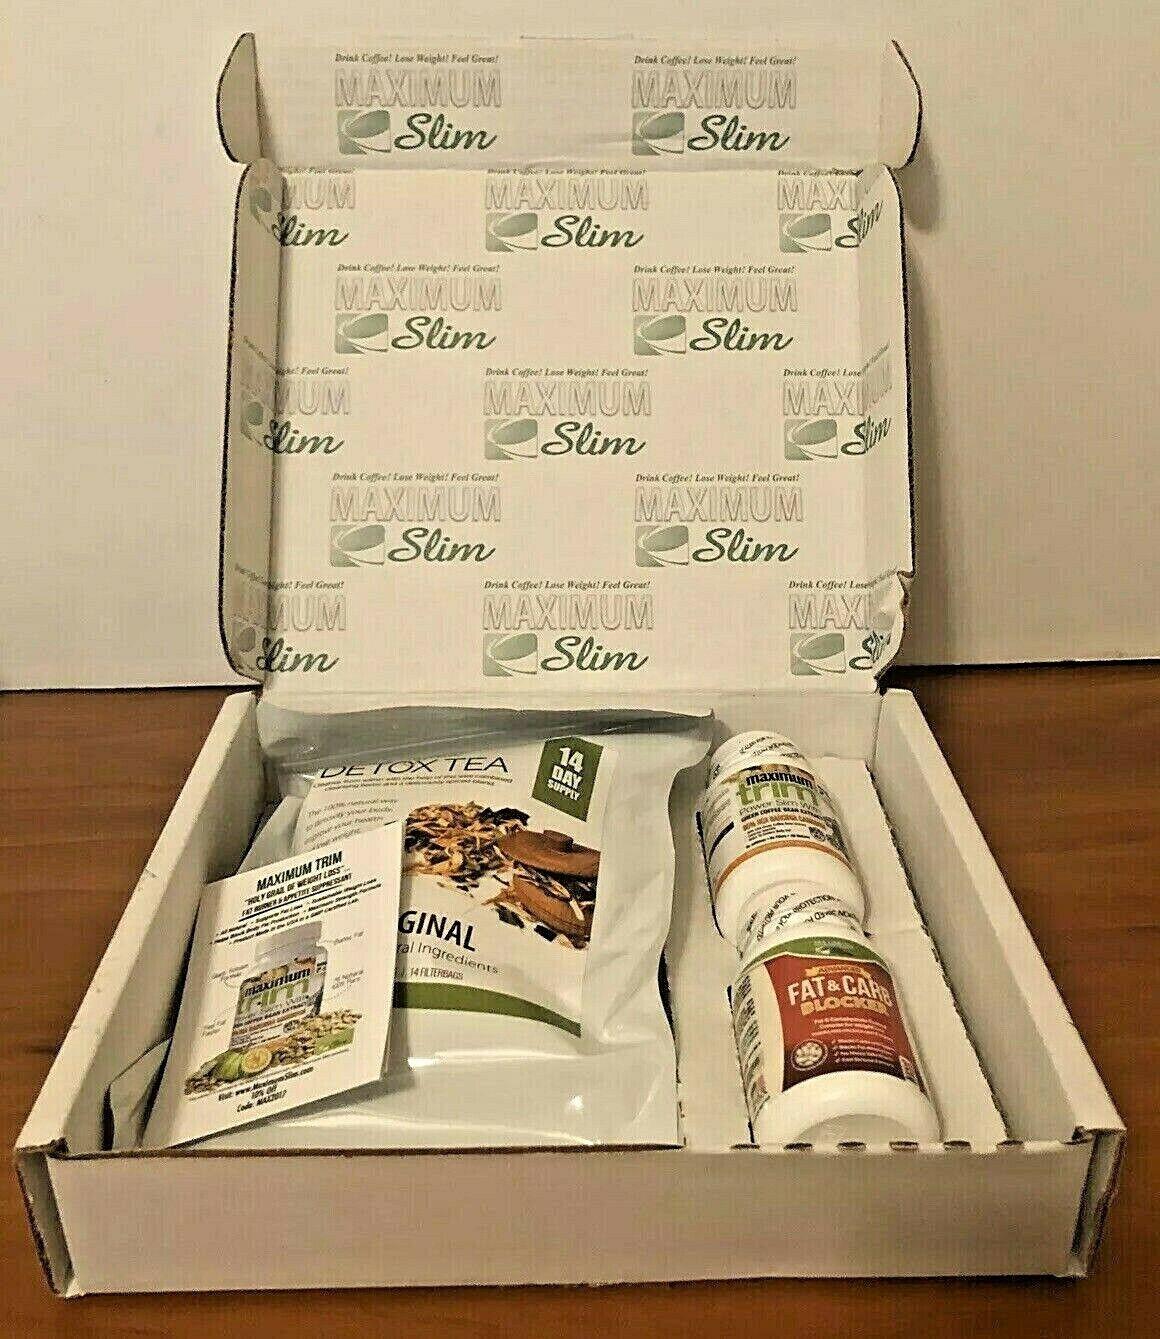 NEW!! Premium ORGANIC TEA BOOSTS your Metabolism DETOXES you